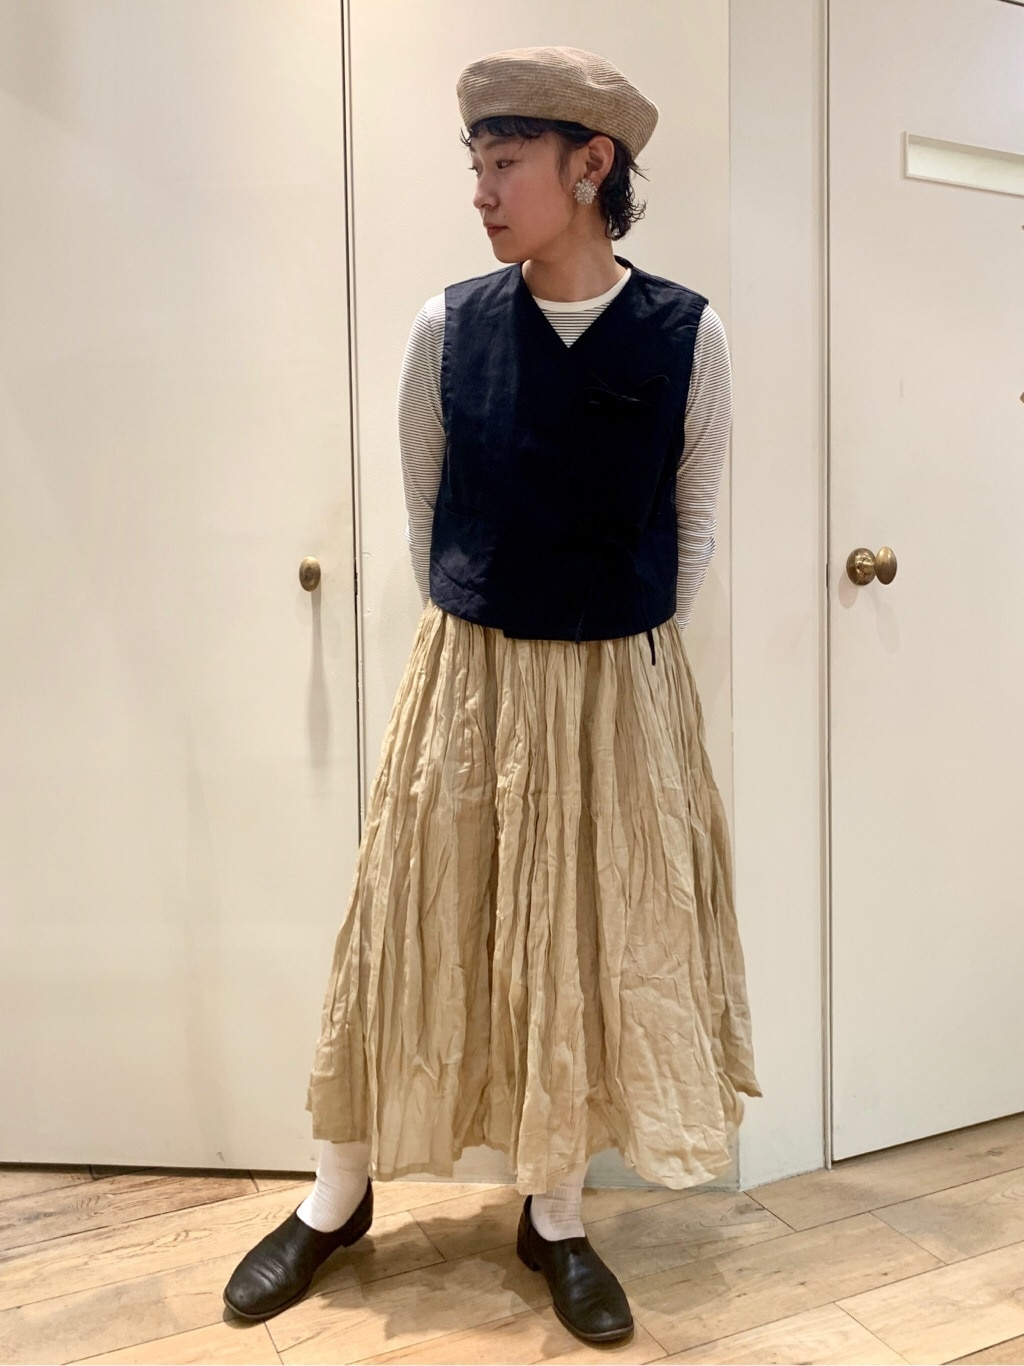 bulle de savon 新宿ミロード 身長:159cm 2020.04.09